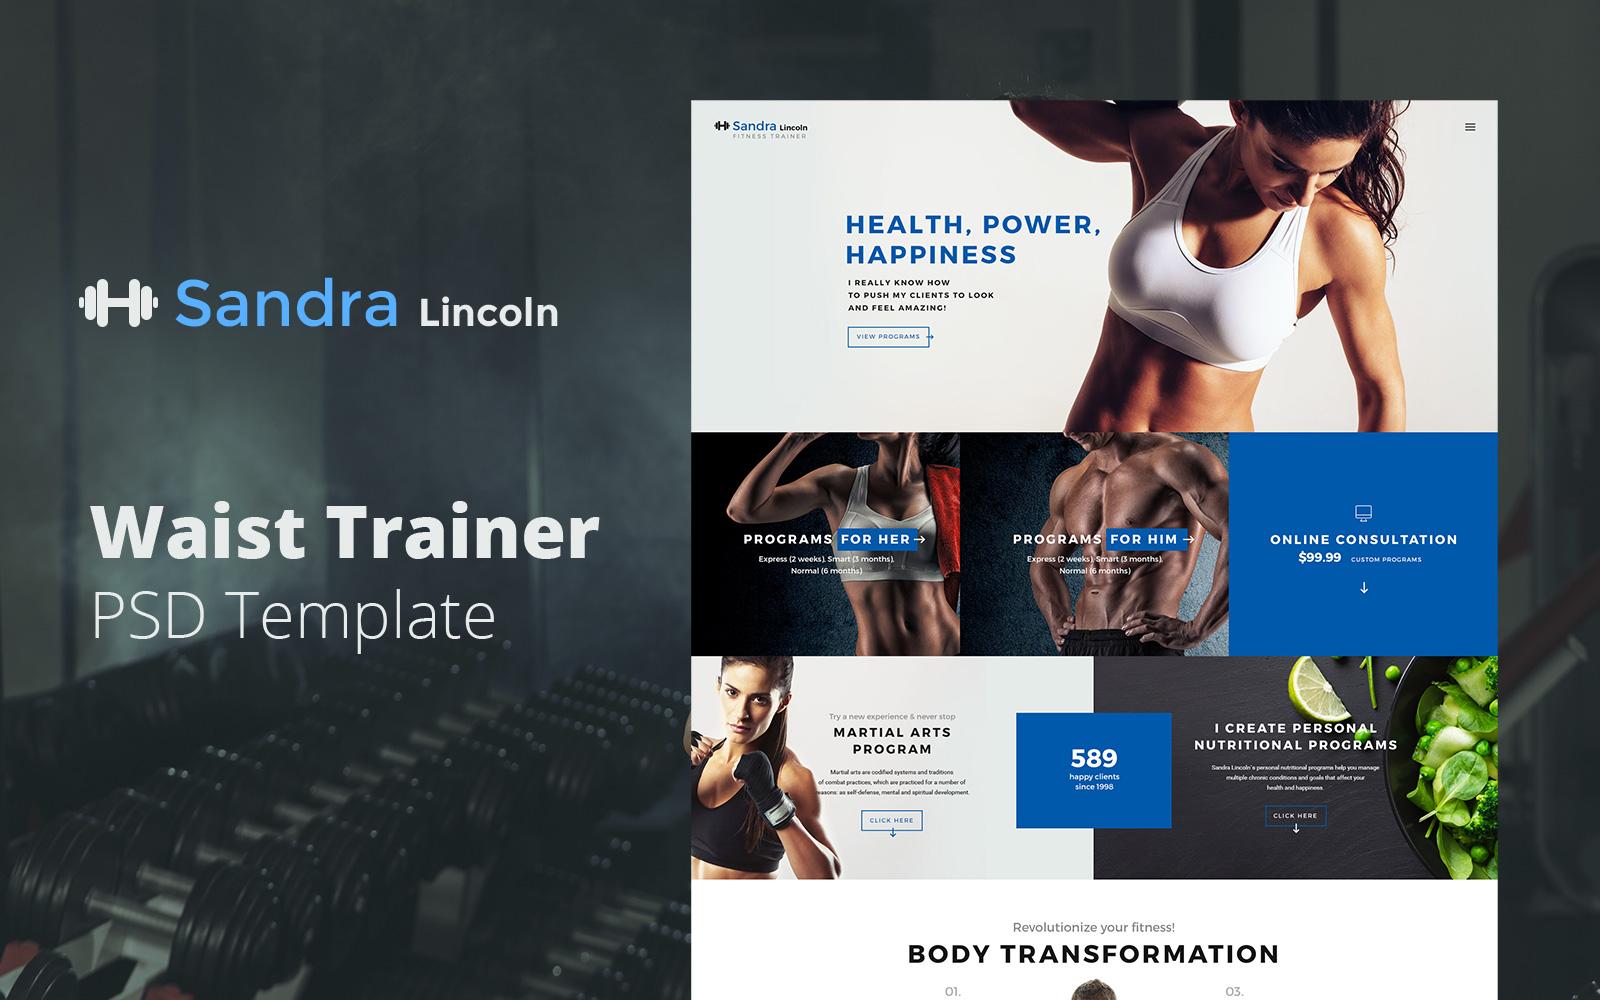 Sandra Lincoln - Waist Trainer PSD sablon 122284